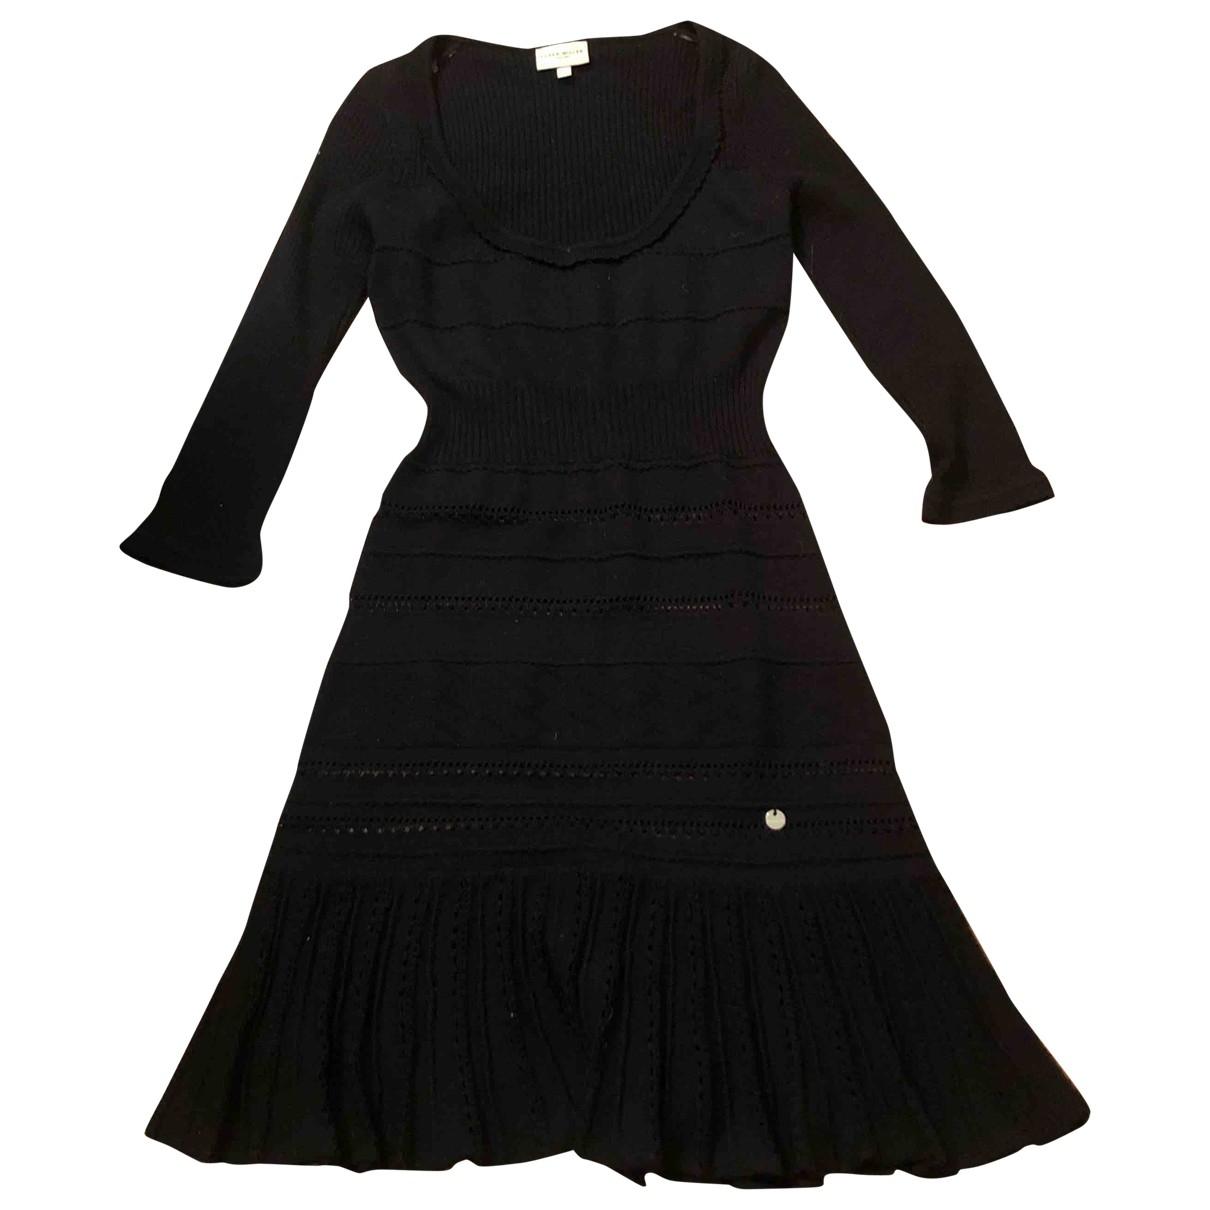 Karen Millen \N Black Wool dress for Women 34 FR